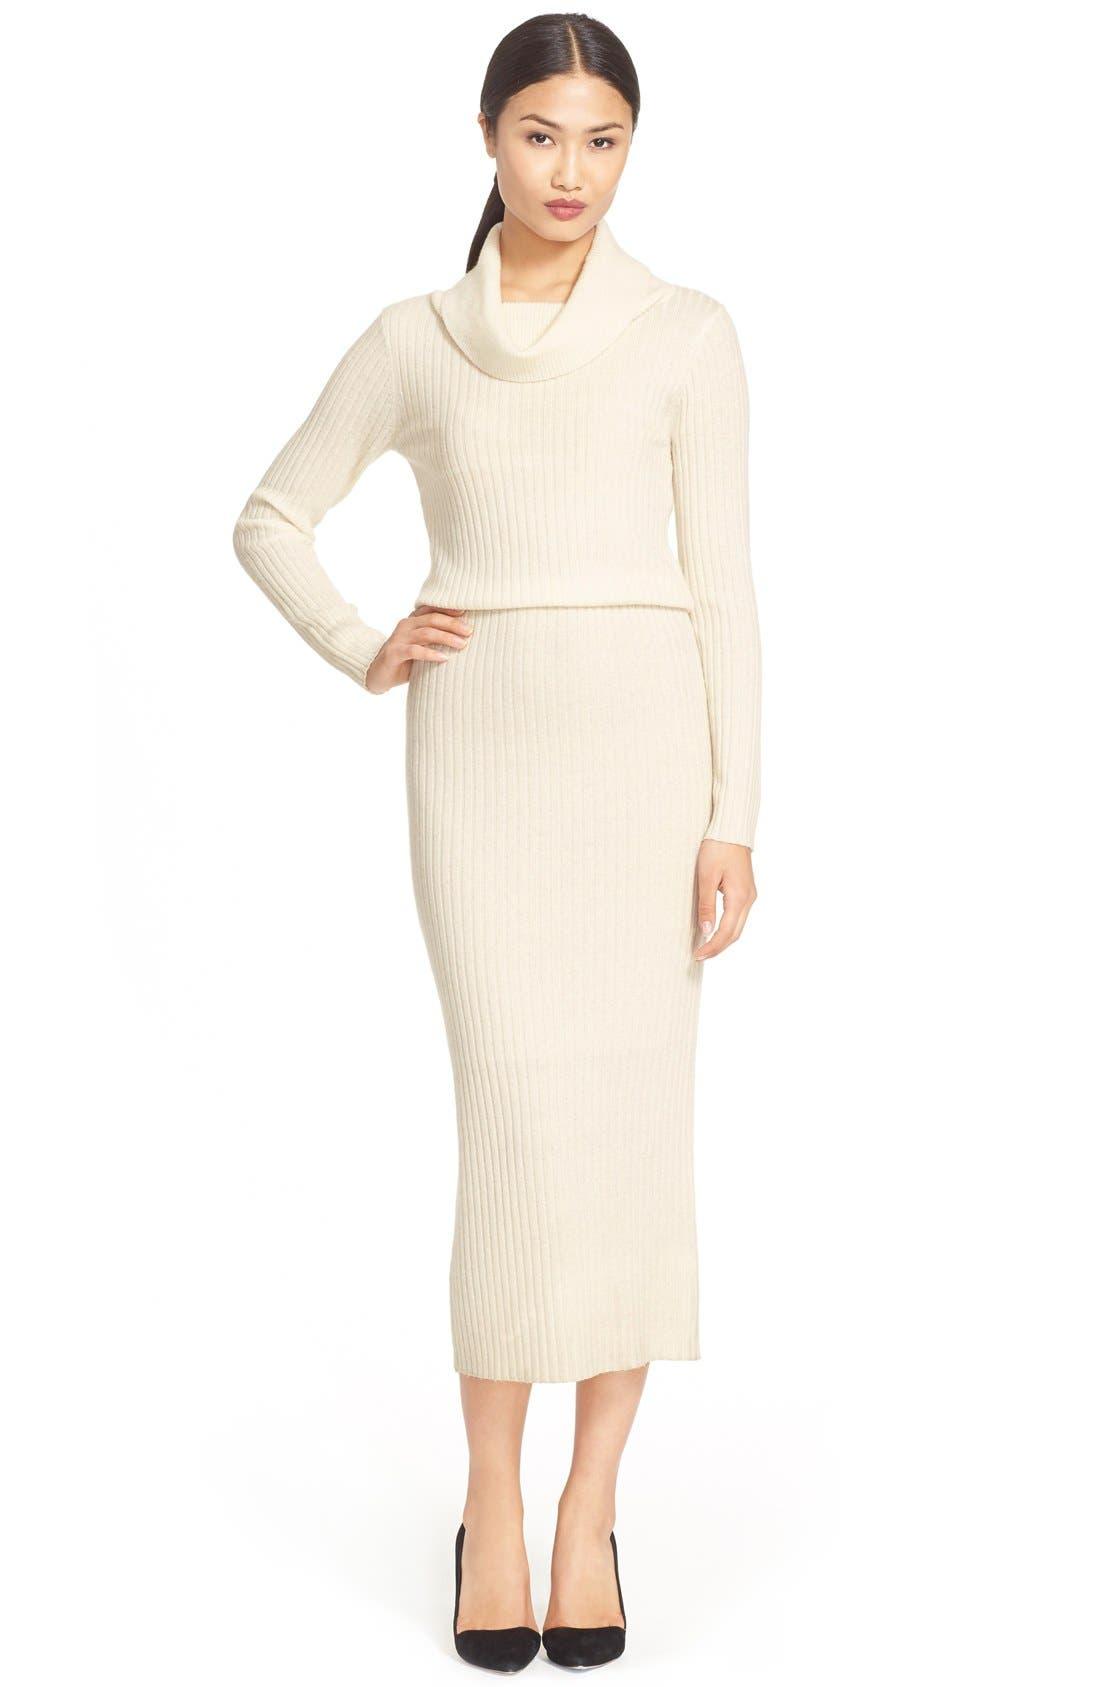 Main Image - Alice + Olivia 'Hailee' Cowl Neck Sweater Dress